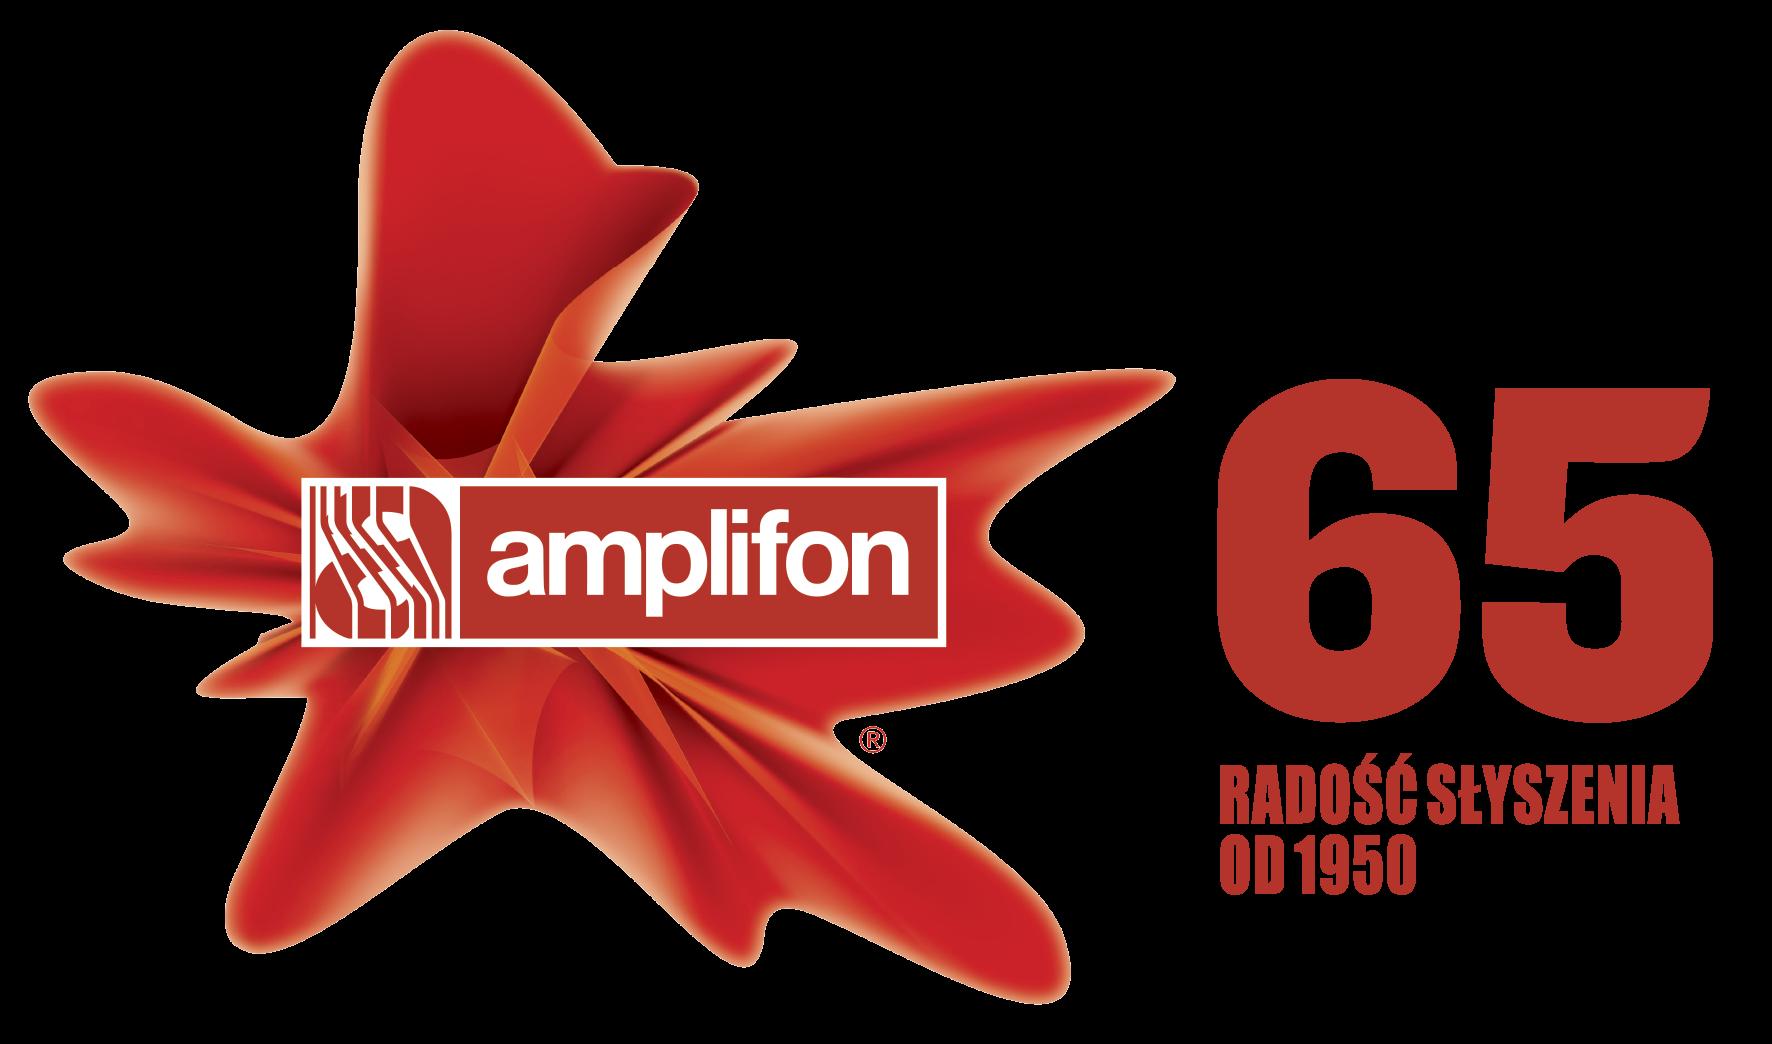 amplifon_logo1